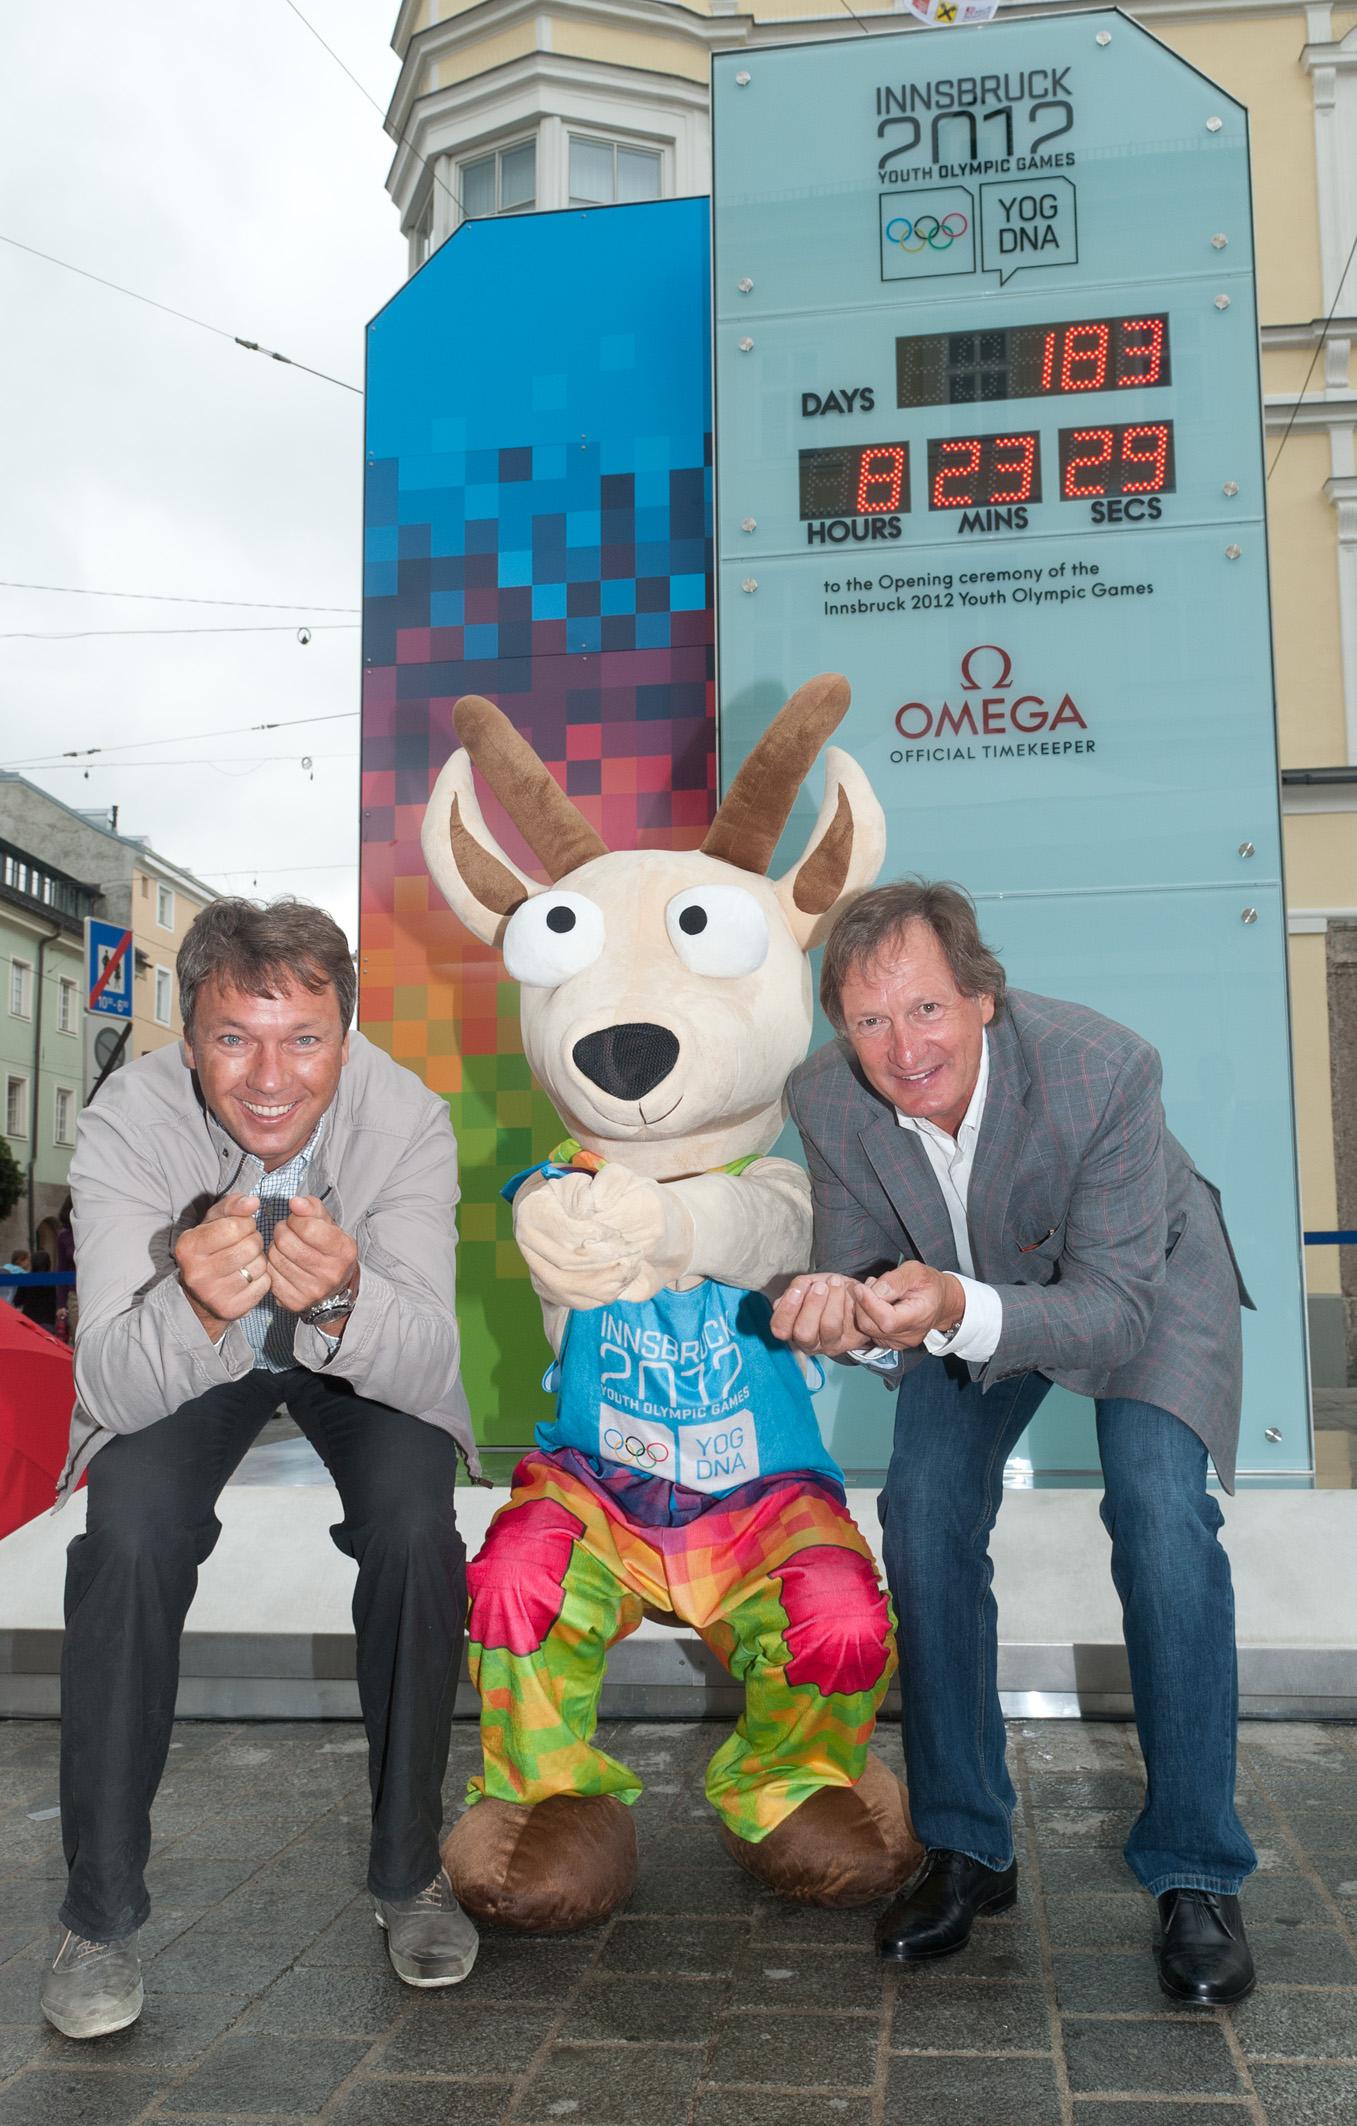 Innsbruck_2012_mascot_at_opening_of_Countdown_Clock_July_14_2011